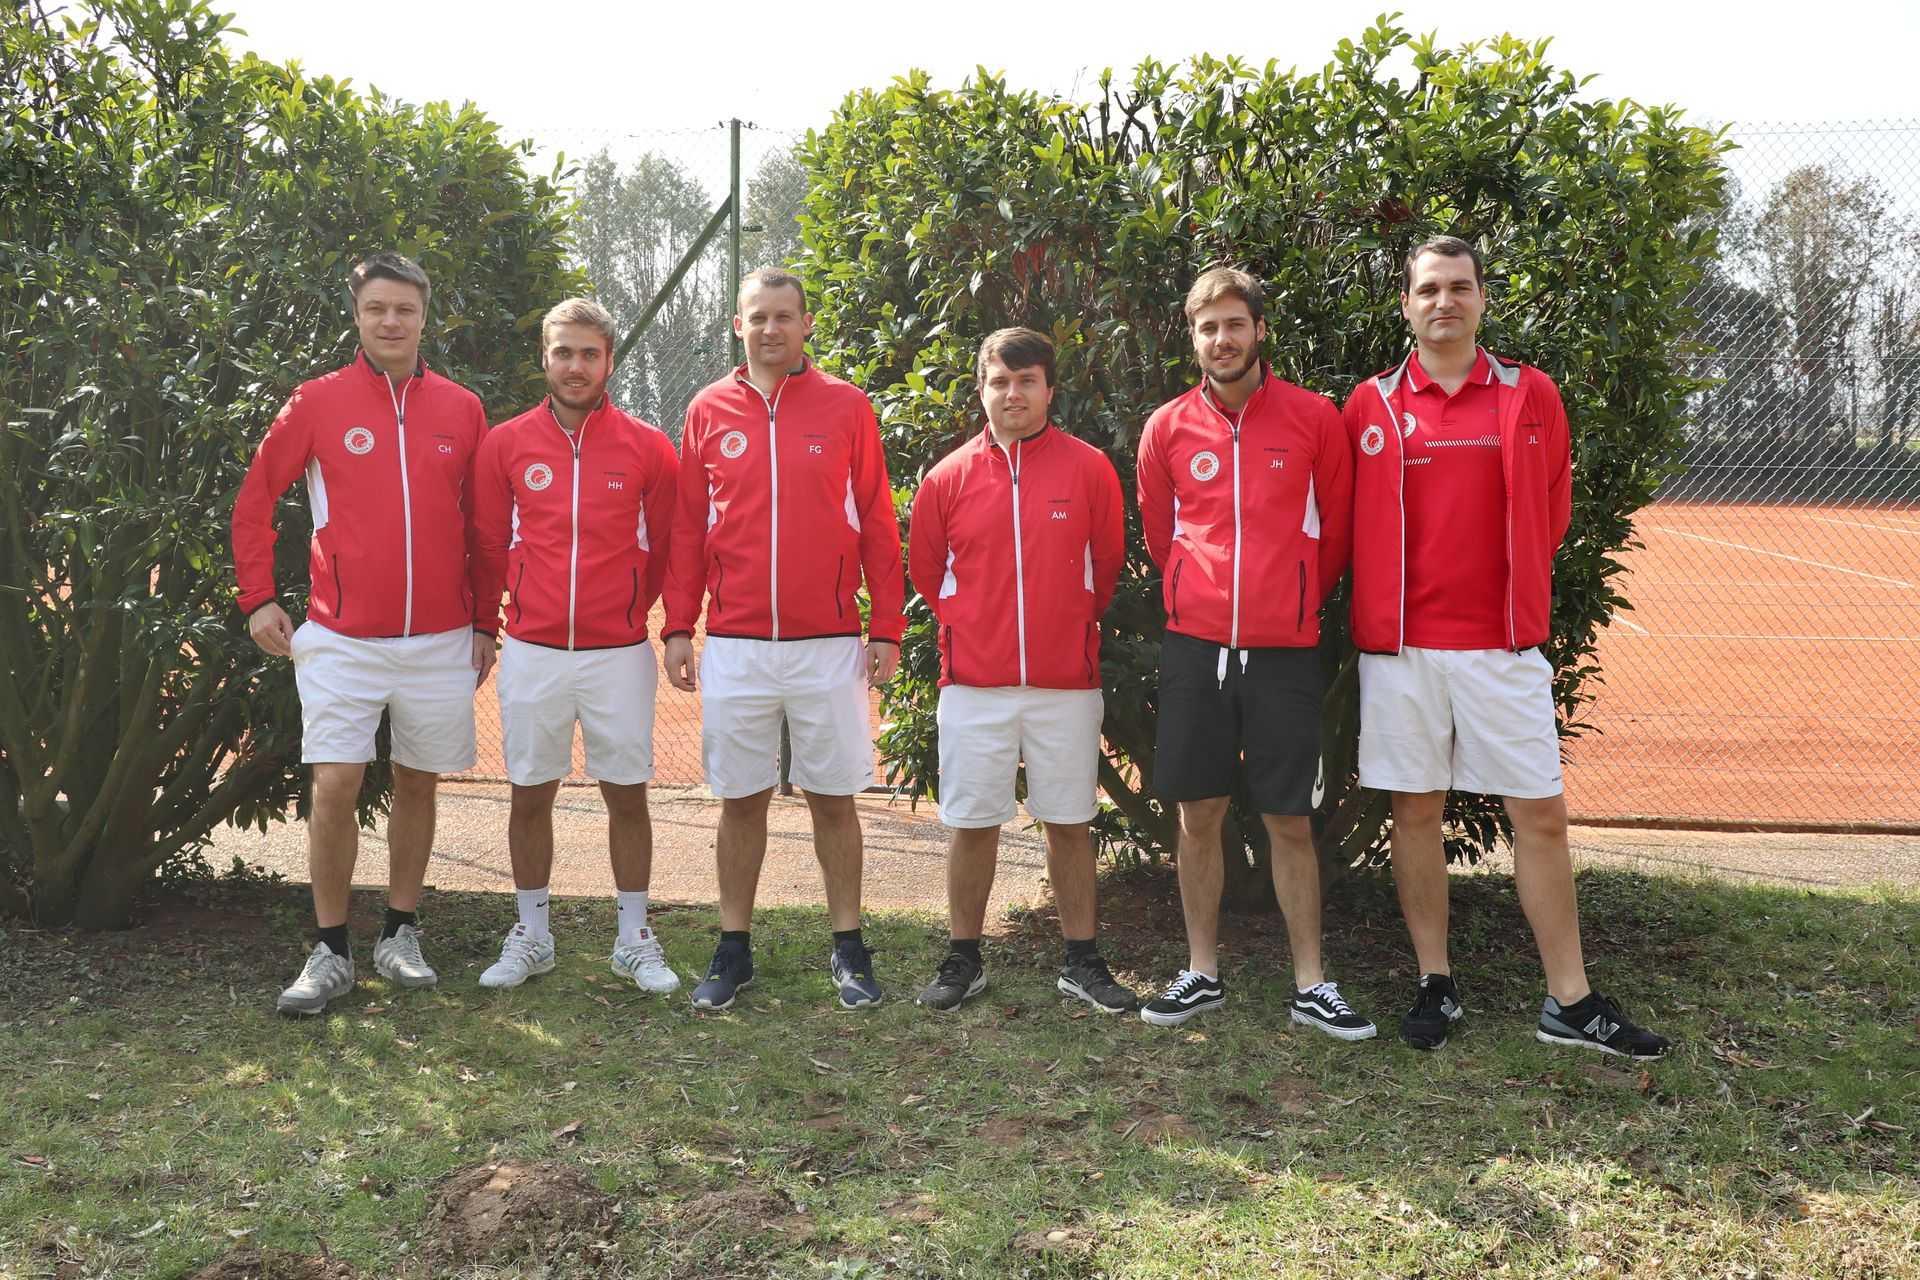 Tennisverein Kenzingen manschafte 14